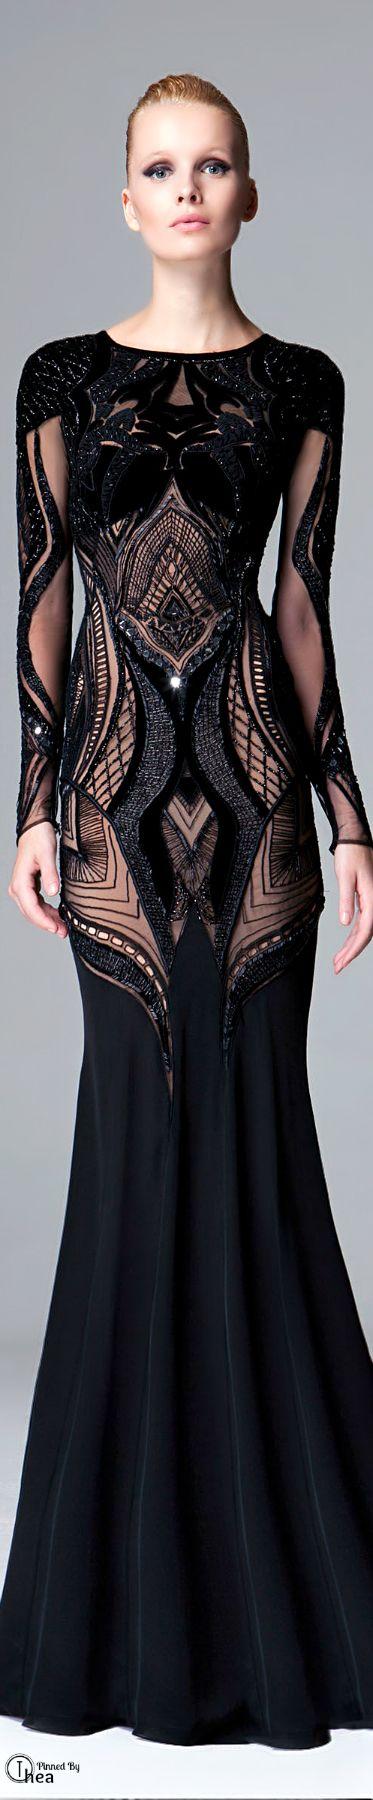 black-dress-vestido-preto-nada-básico-para-festas-de-fim-de-ano 14